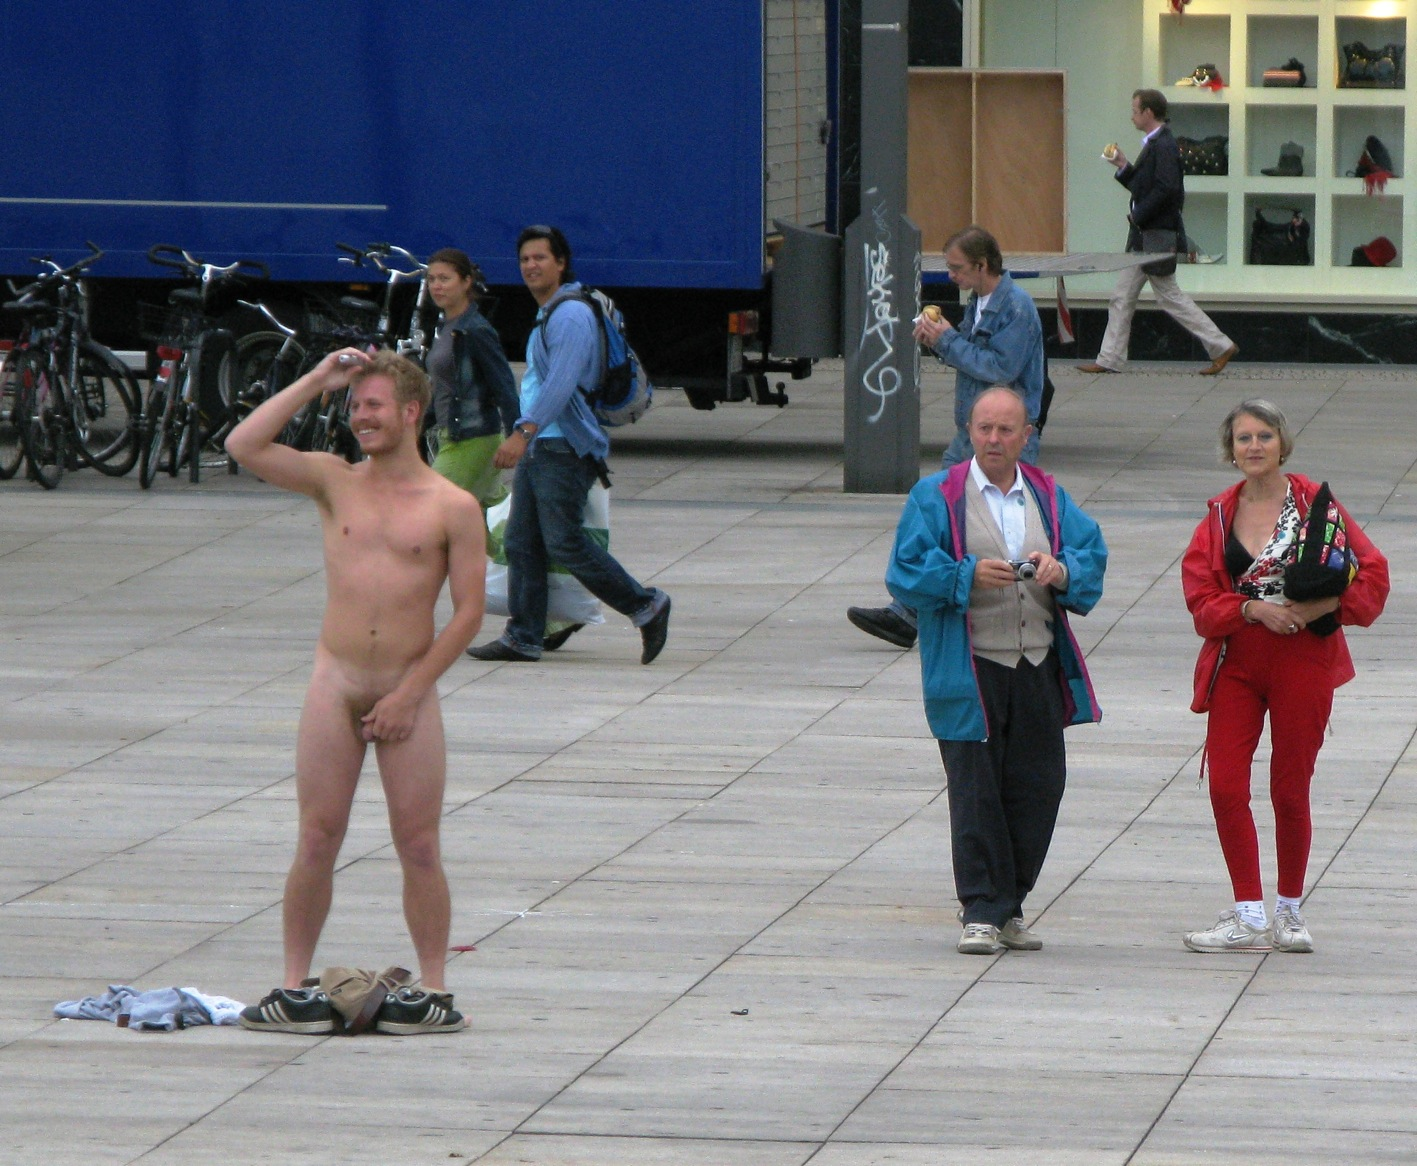 Public display of erection